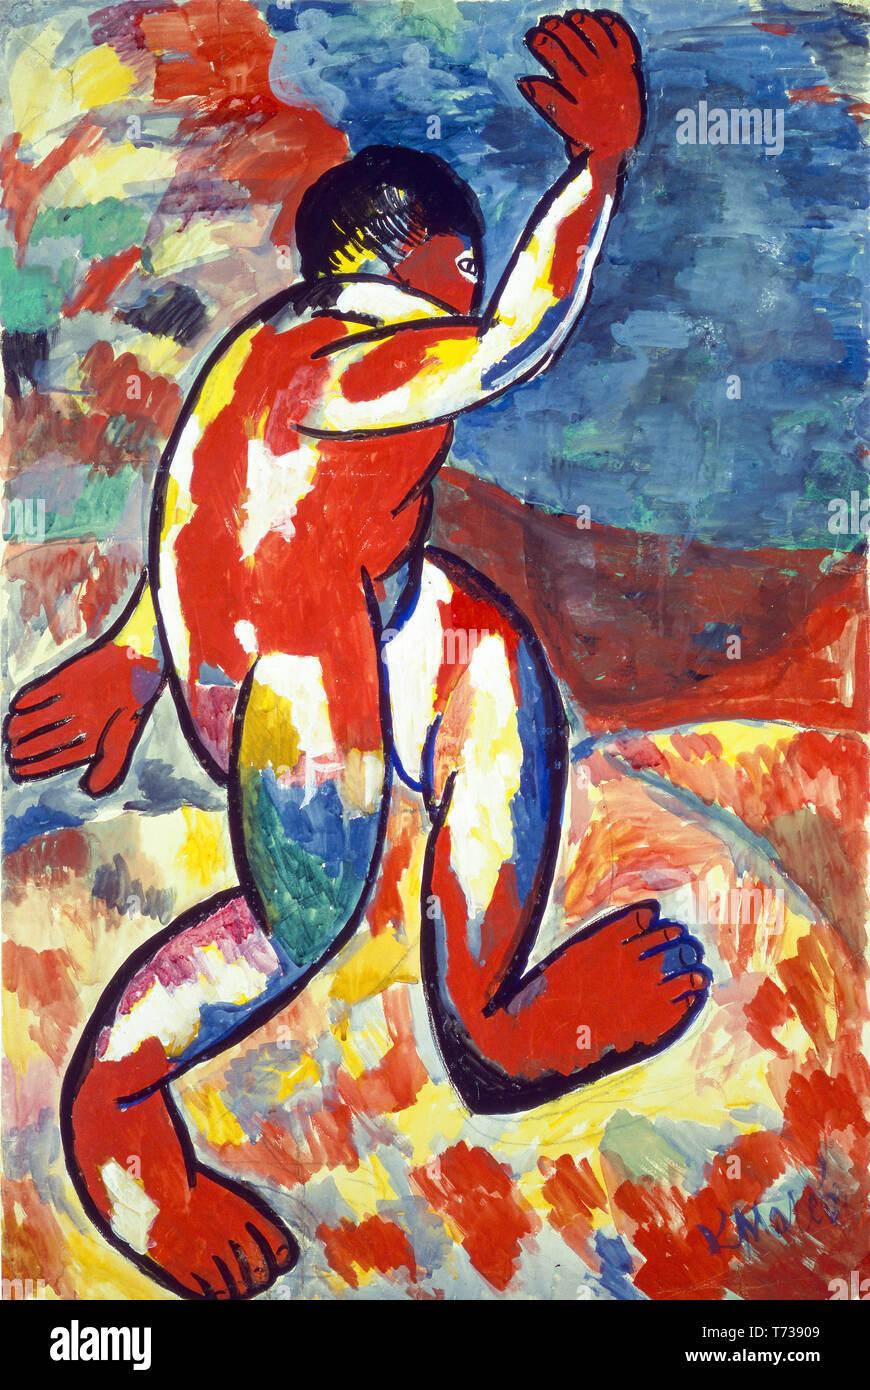 Kazimir Malevich, bagnante, pittura, 1911 Immagini Stock